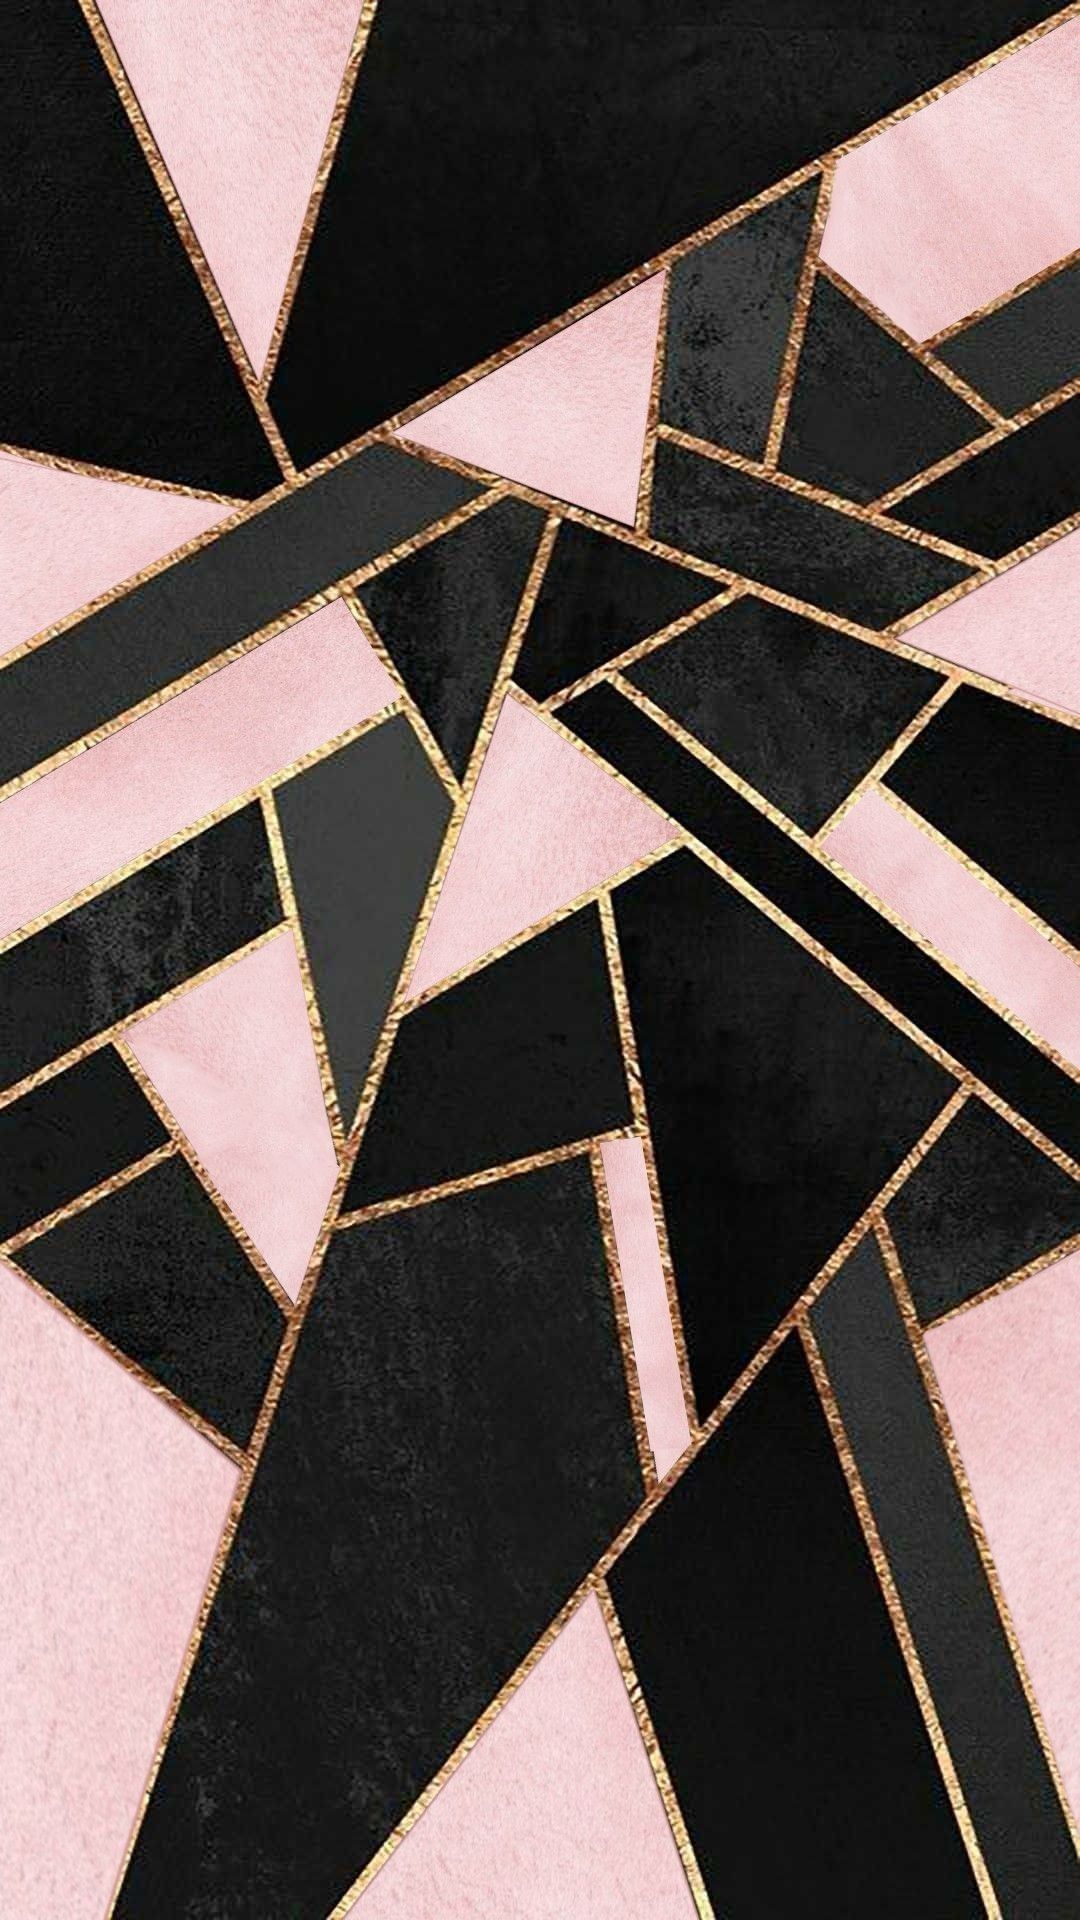 Pin By Liz Lipscomb On Pink Gold Wallpaper Background Glitter Wallpaper Pretty Wallpapers